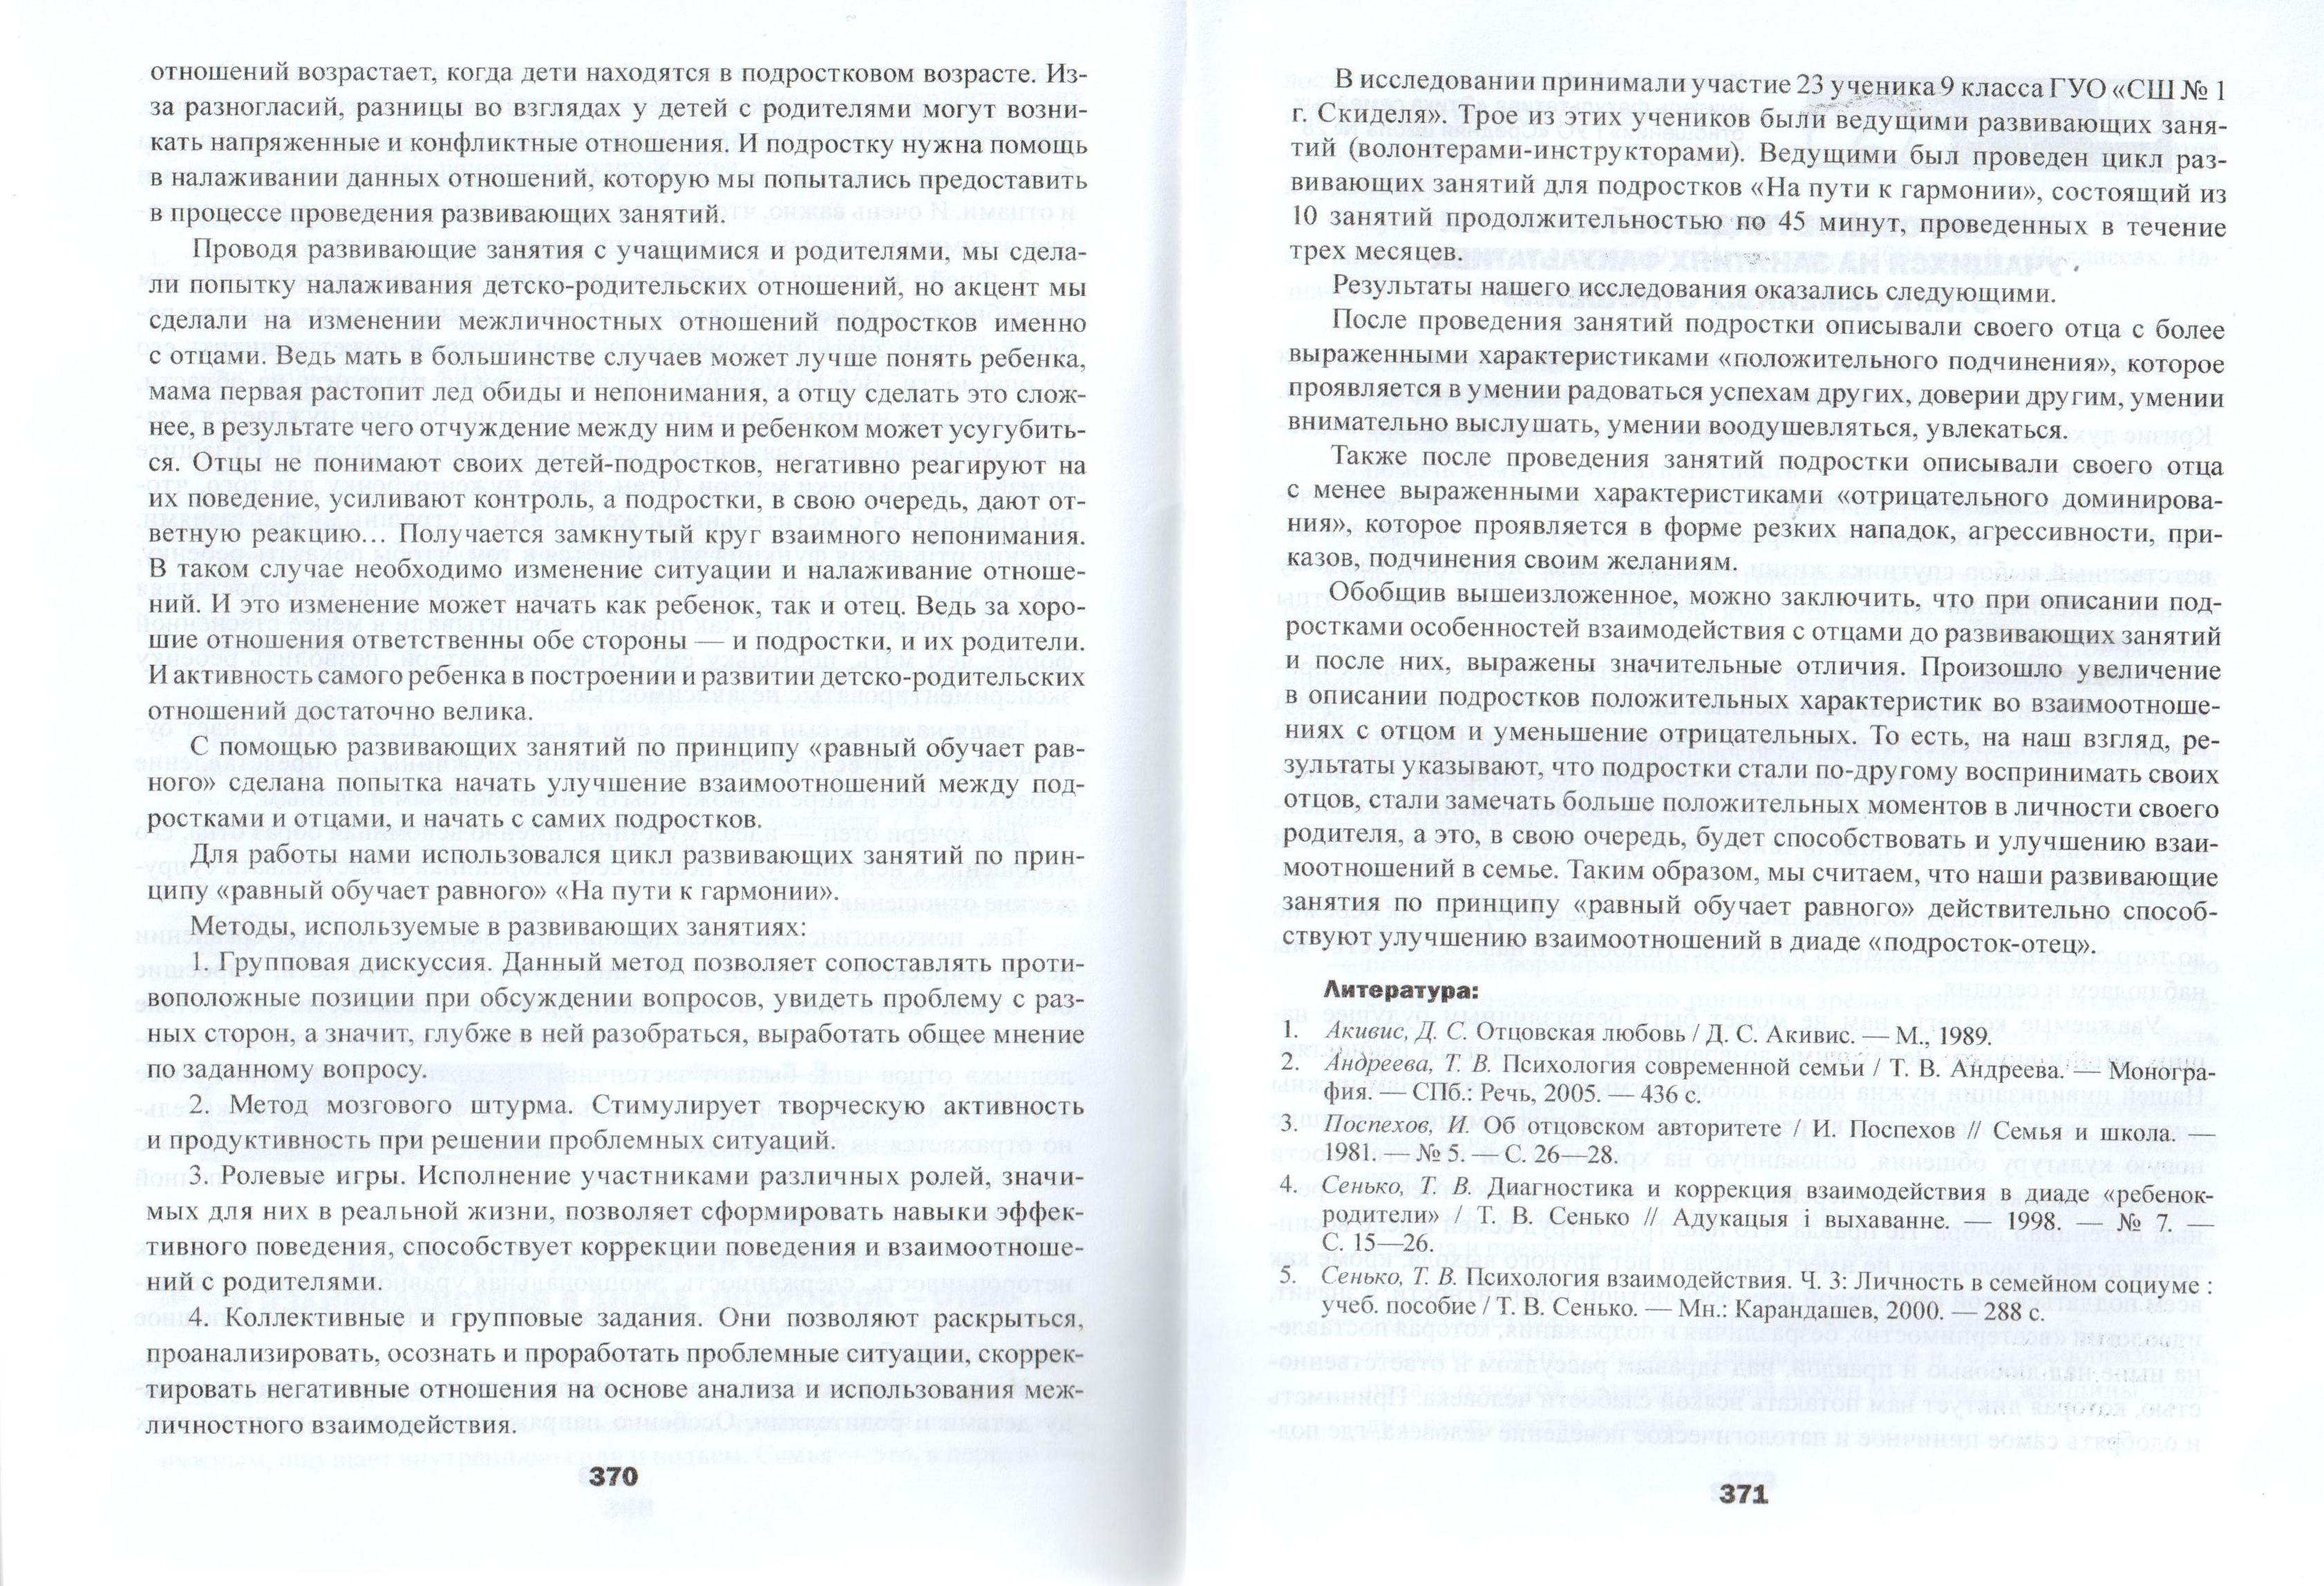 C:\Documents and Settings\Наталья\Рабочий стол\гендер11111.jpg